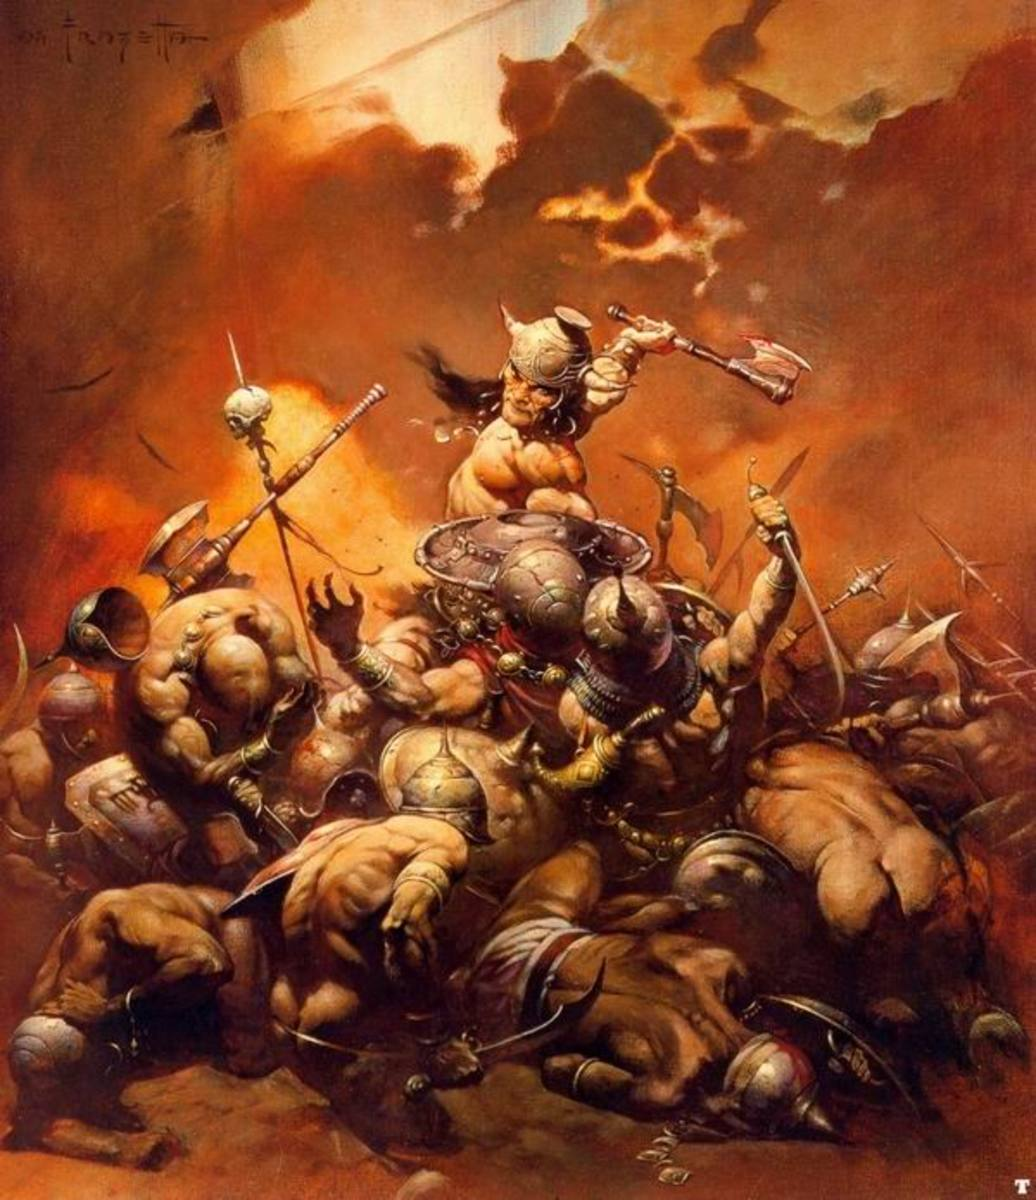 Conan the Destroyer - art by Frank Frazetta